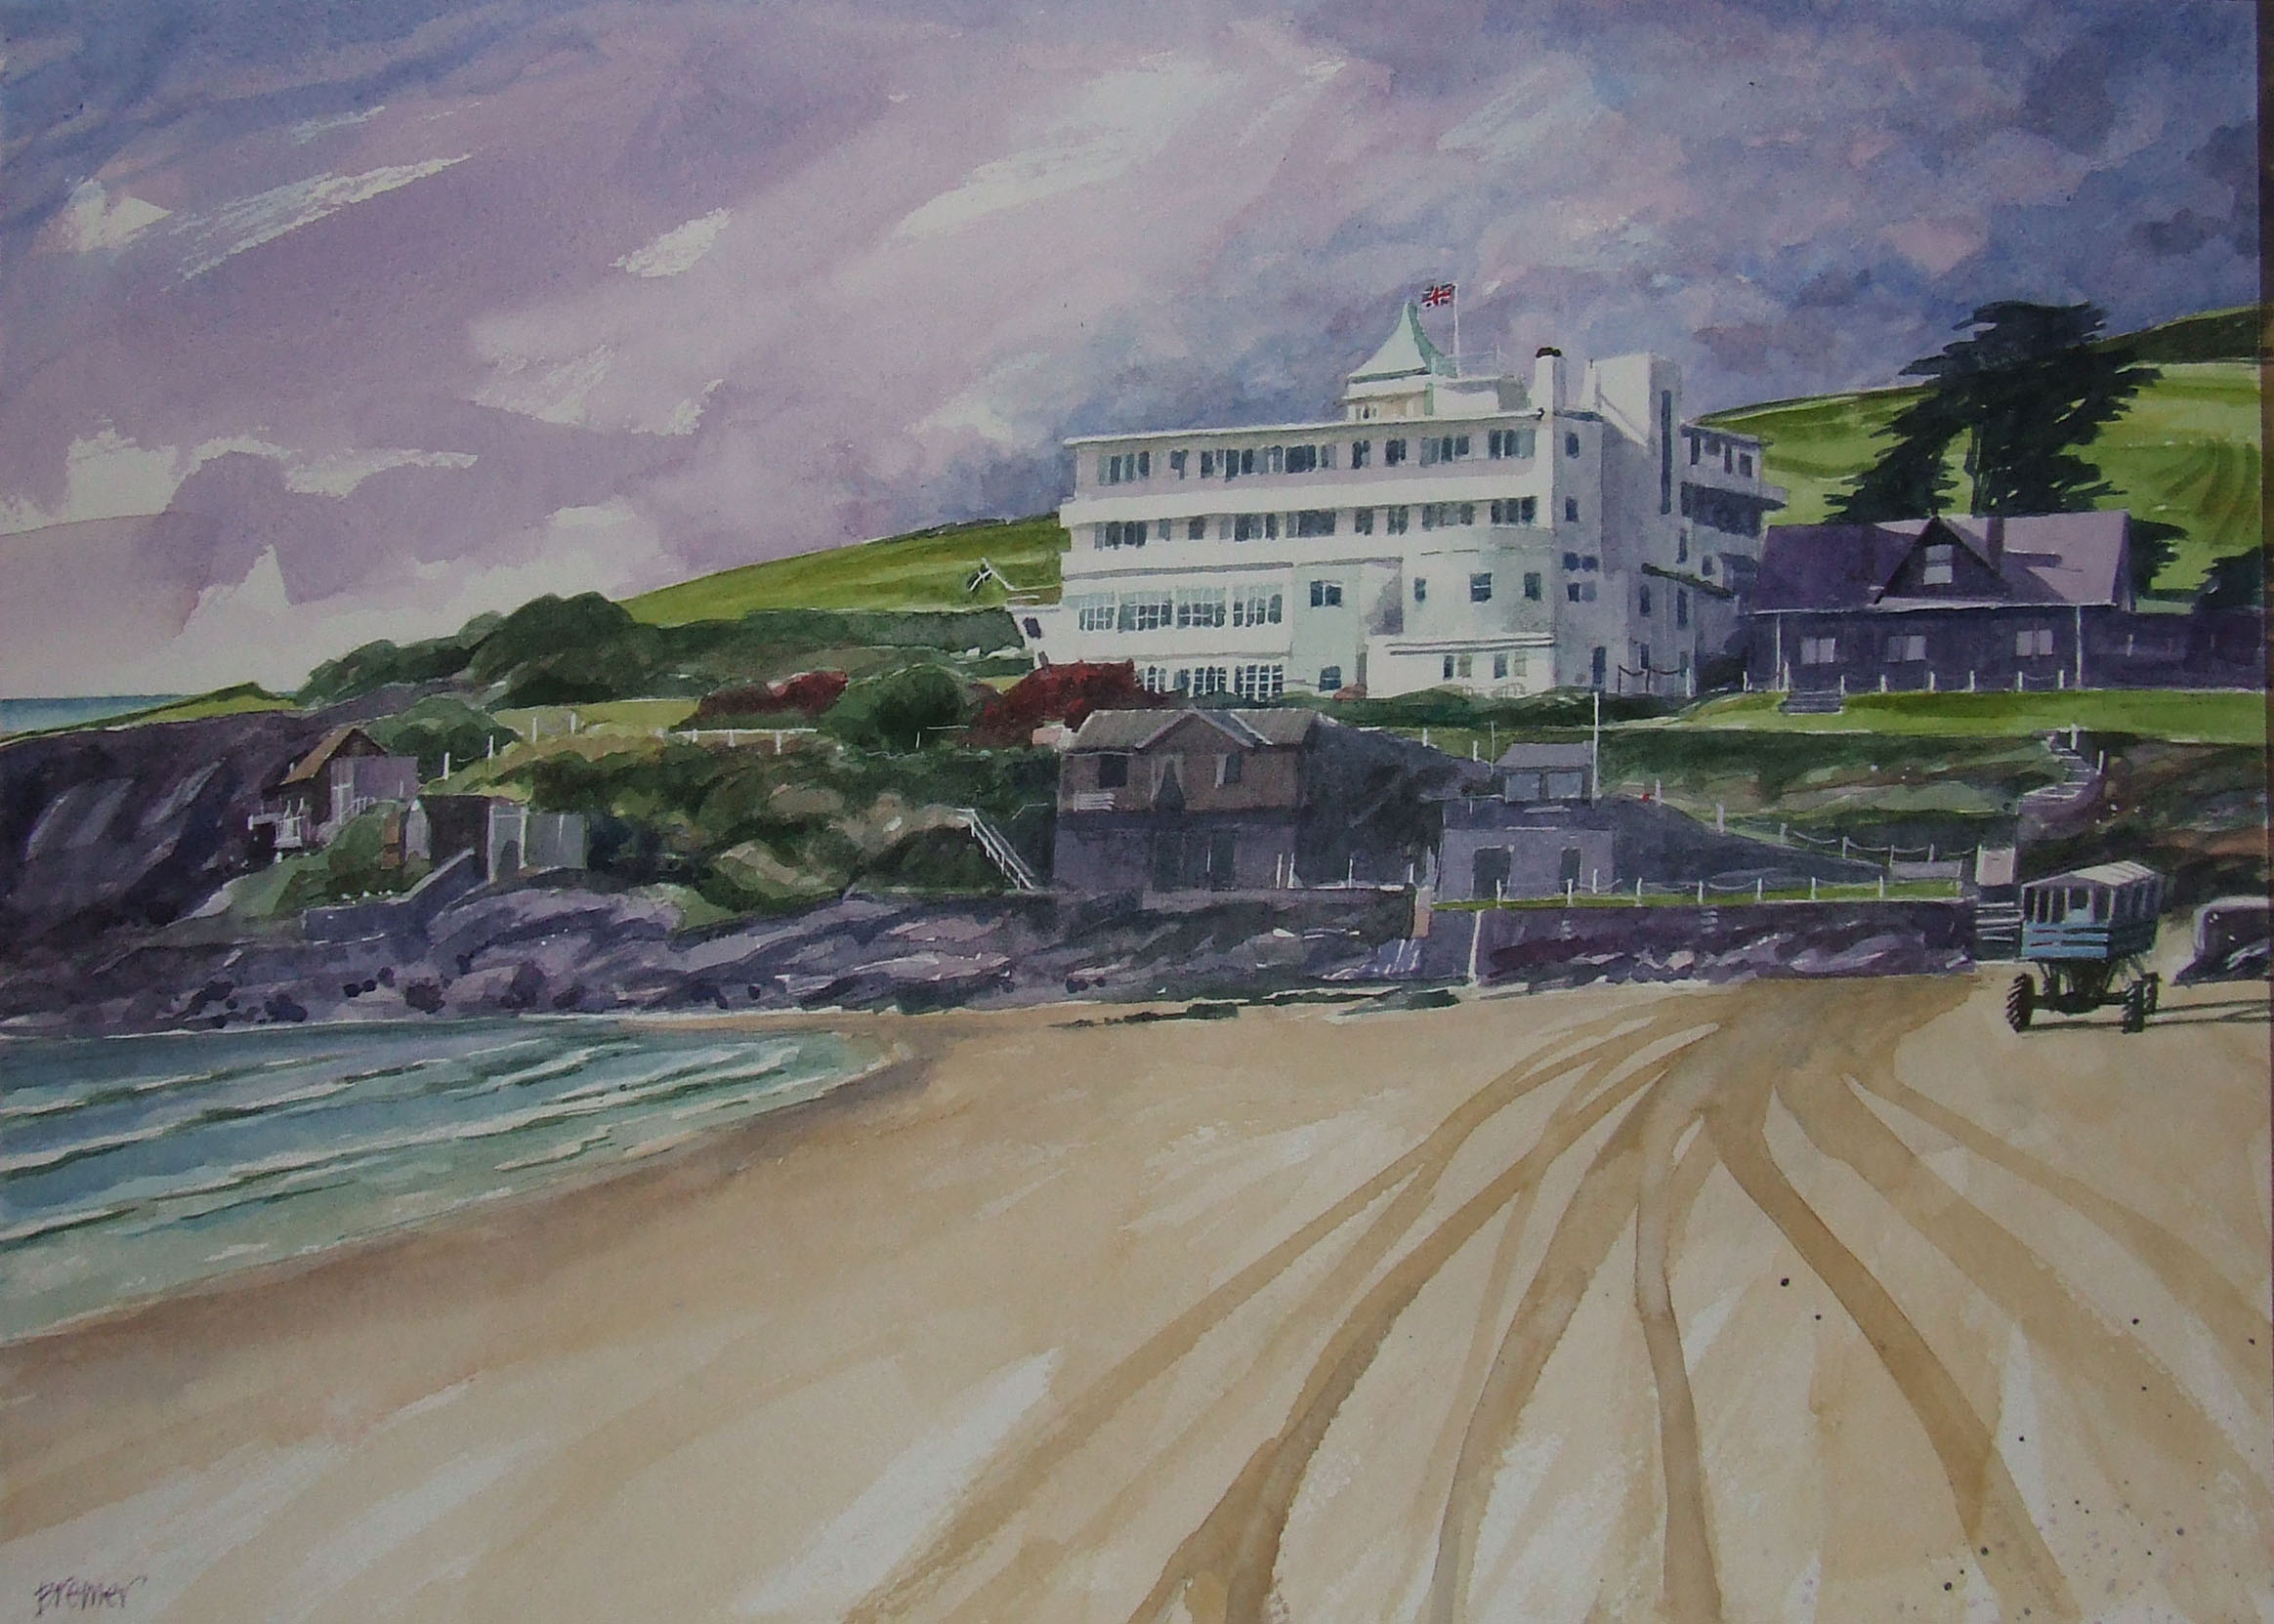 Burgh Island Hotel I